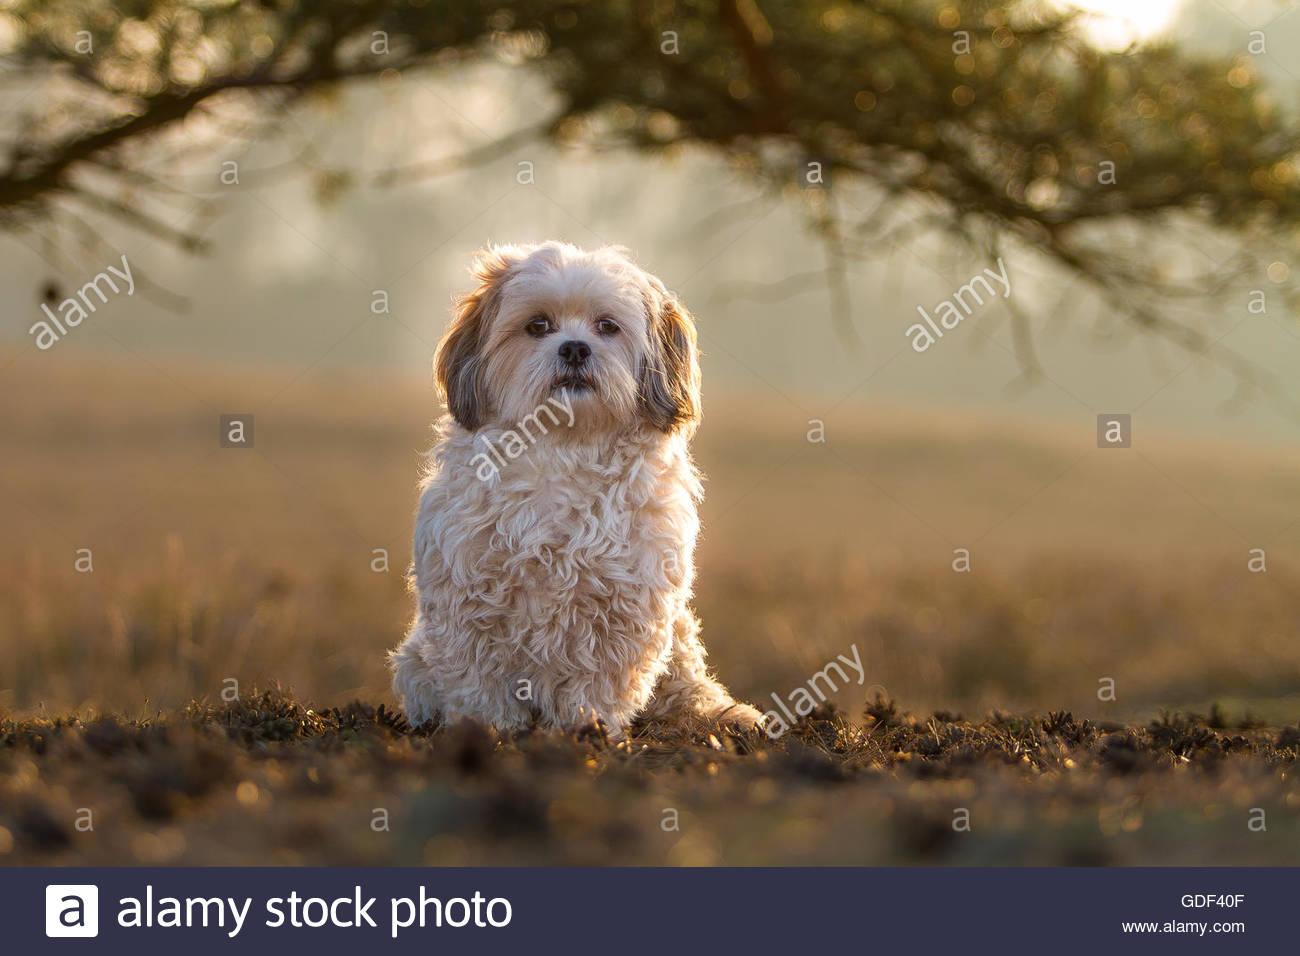 Mixed Breed Dog Male Dog Maltese X Shih Tzu Stock Photo 111585167